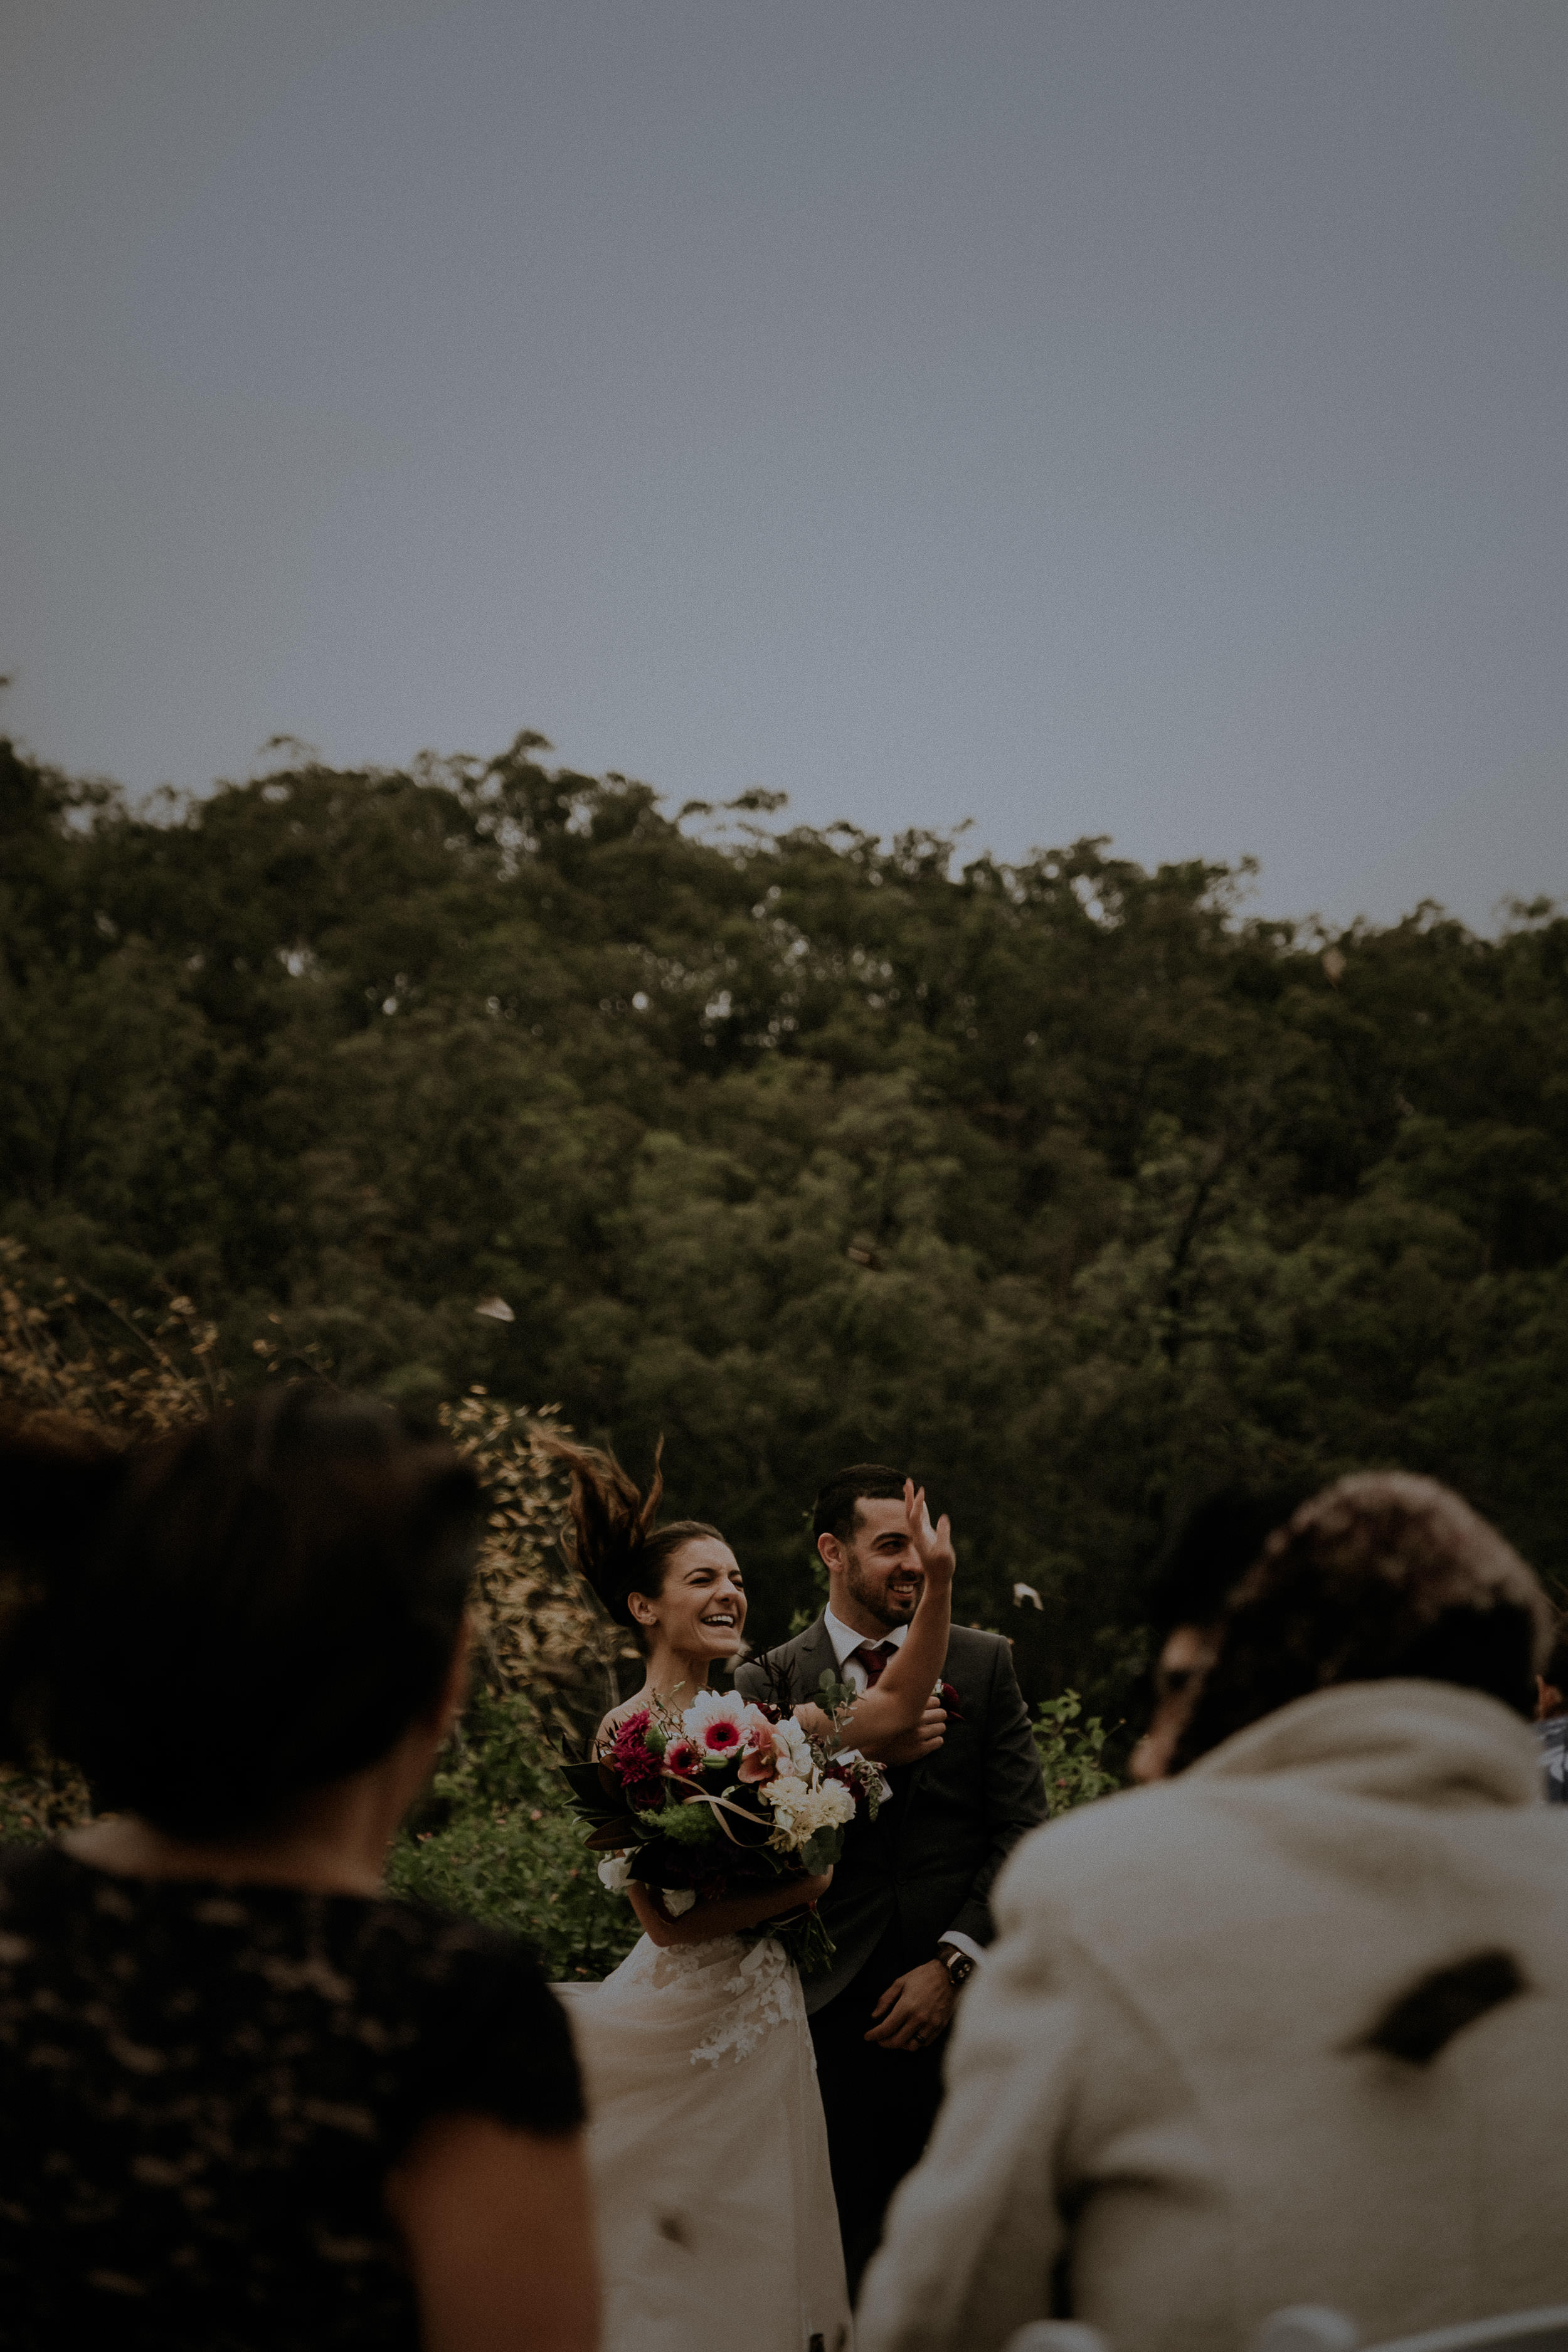 g_c wedding - kings _ thieves elopement wedding photography - blog 48.jpg